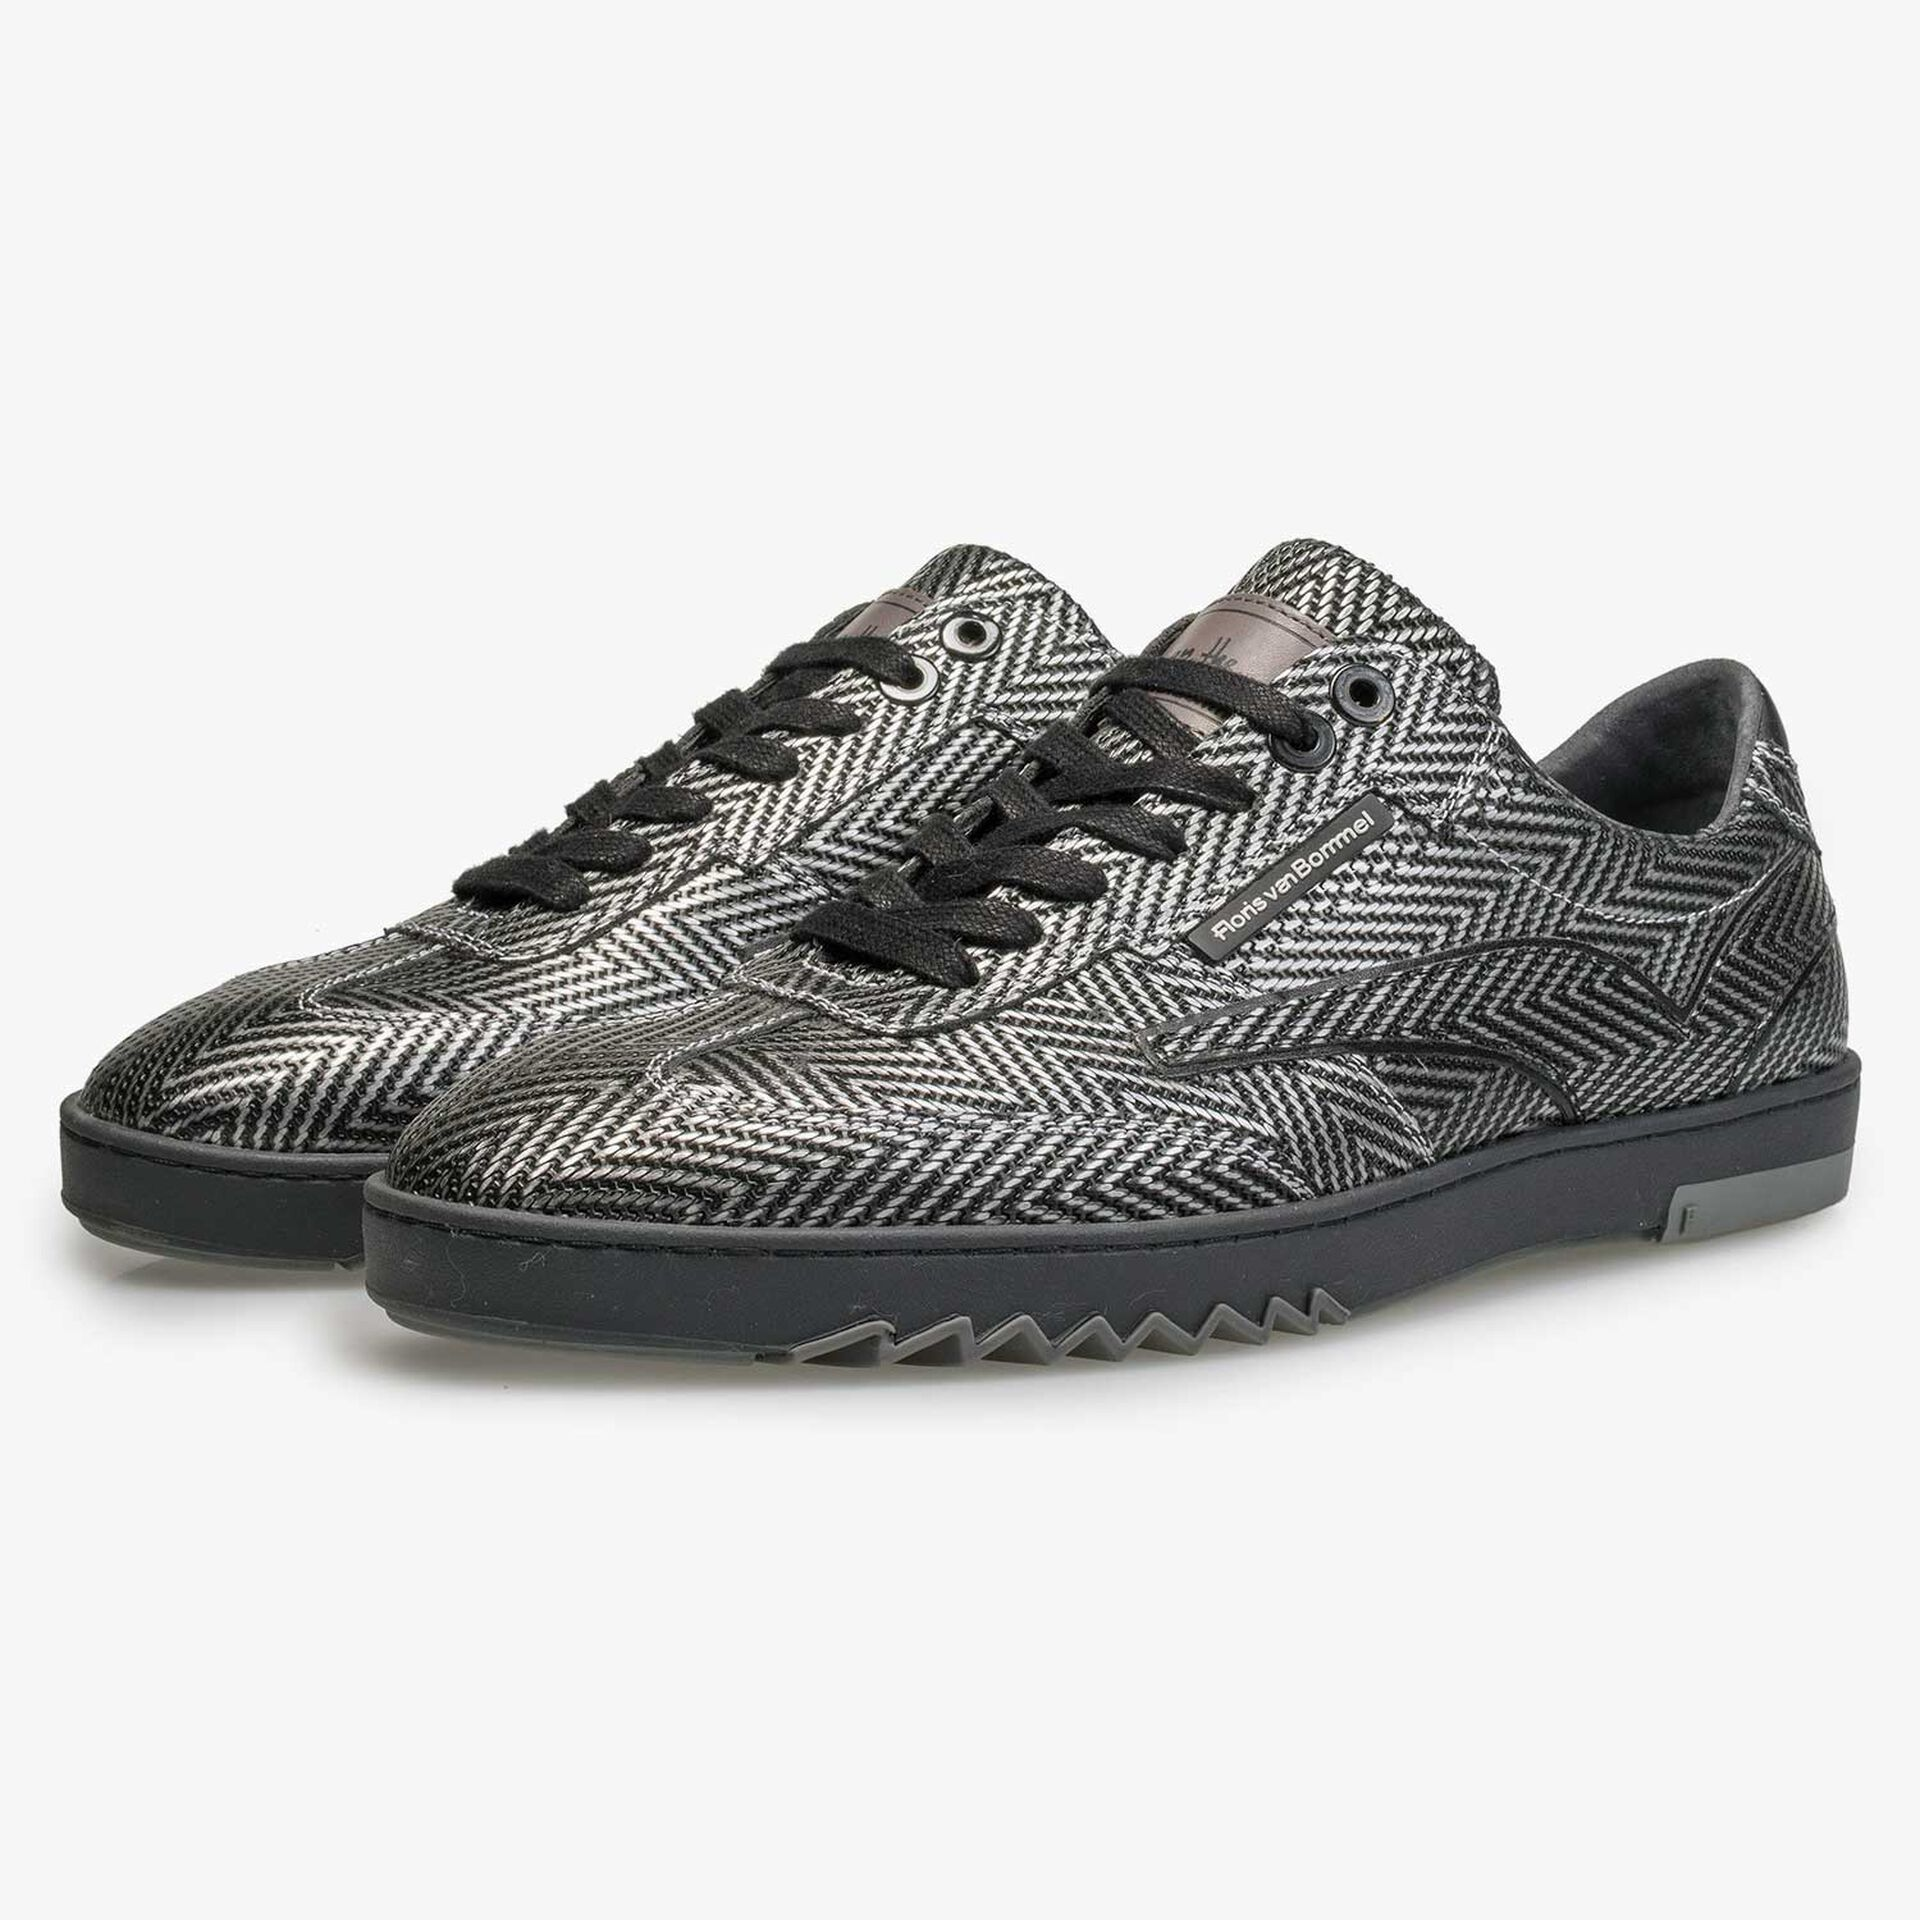 Premium sneaker with metallic herringbone pattern